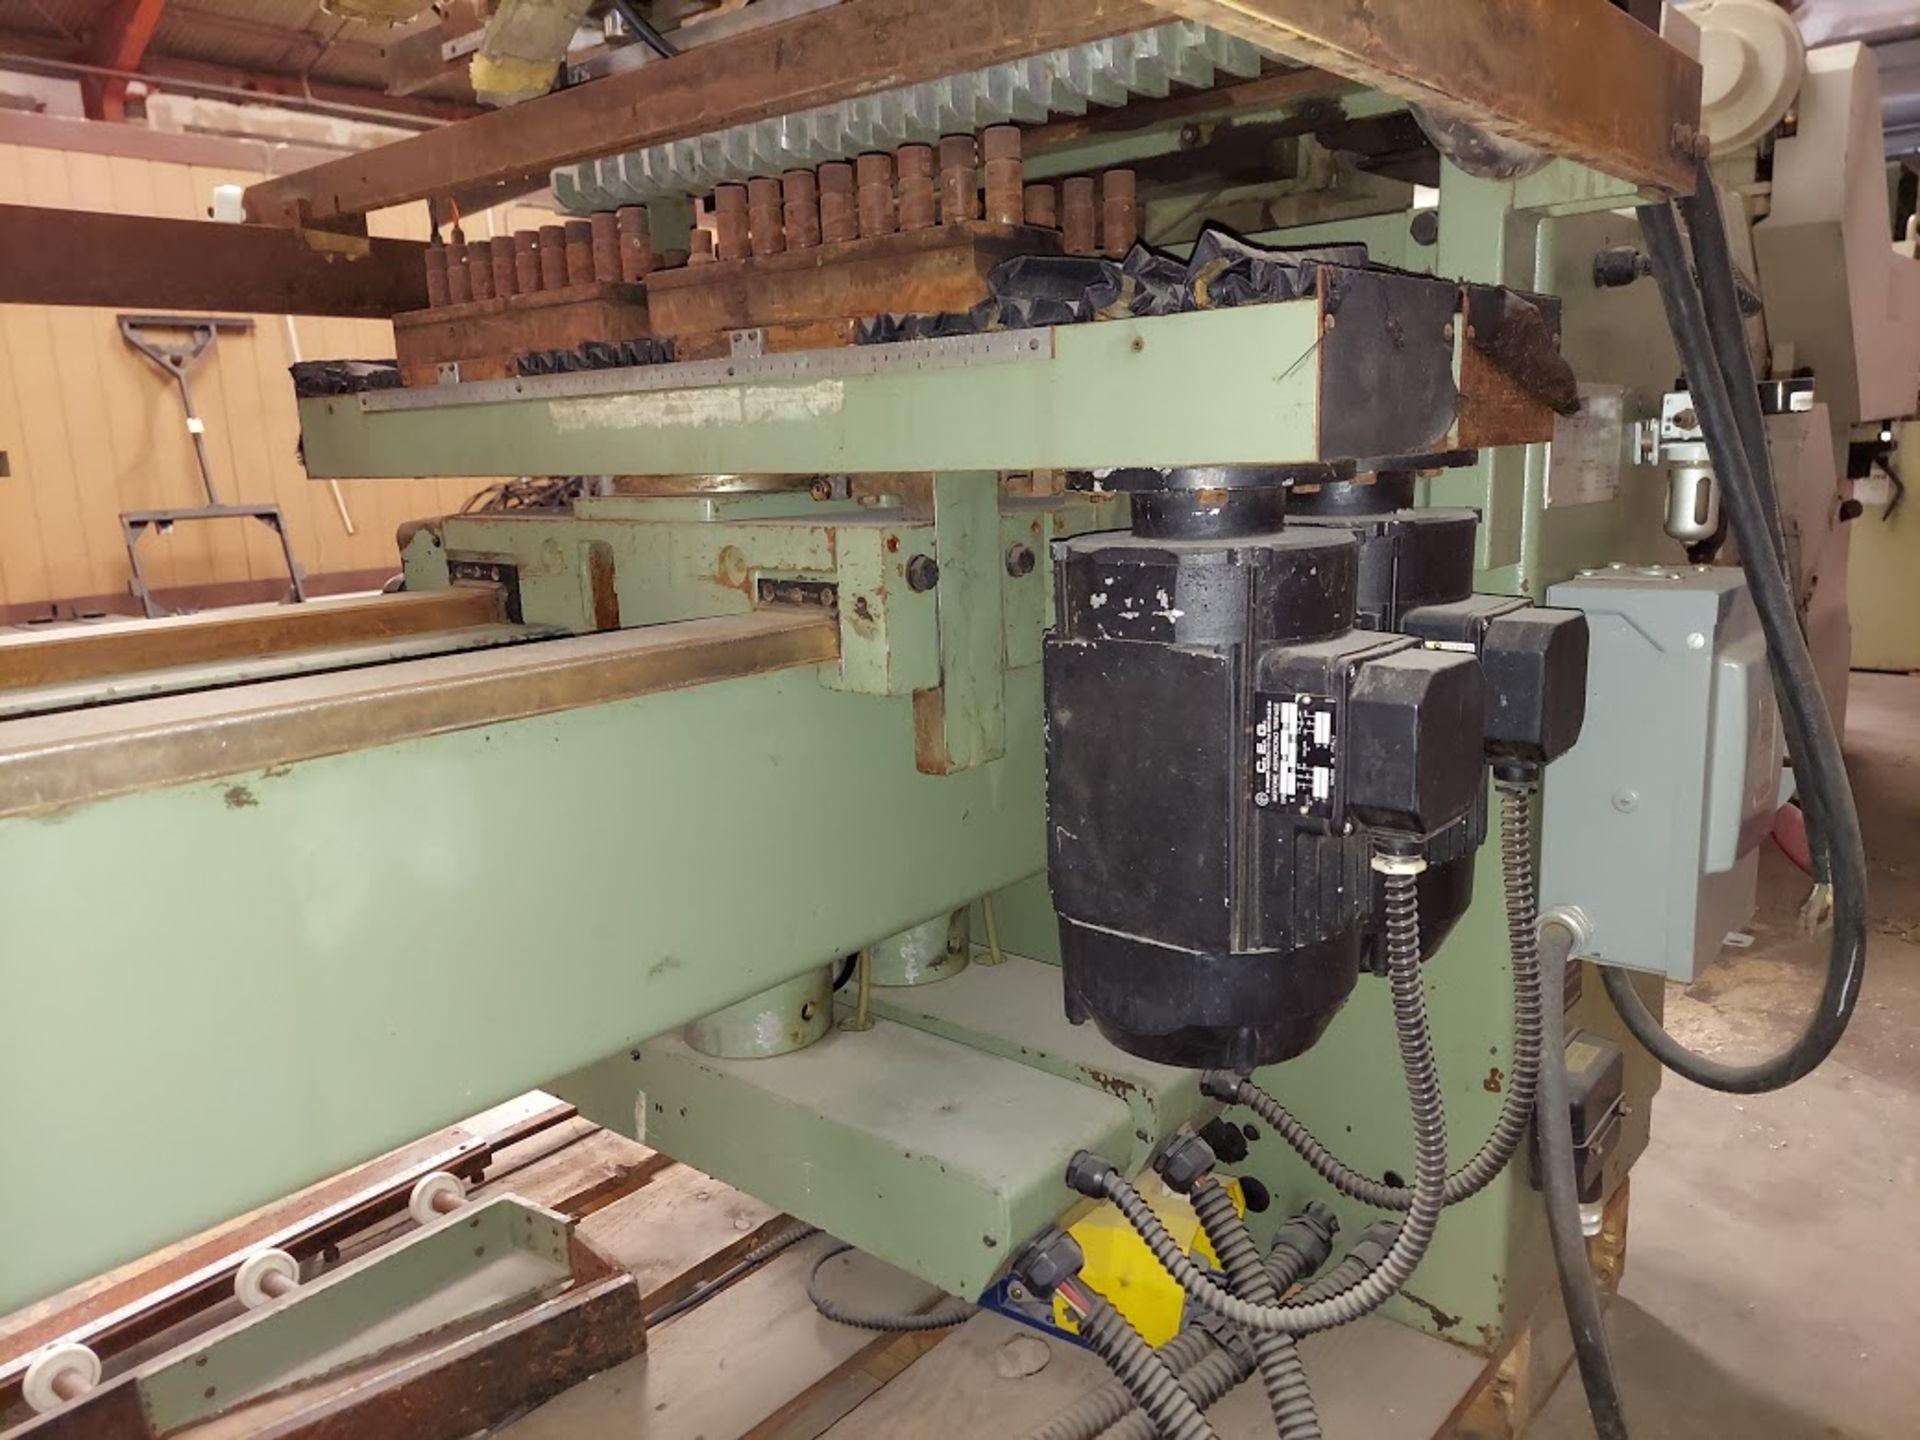 Zangheri & Boschetti Mulit Mat P3 Line Boring Machine, Model #MP3, 1 - 21 Spindle Horizontal Drill - Image 5 of 7